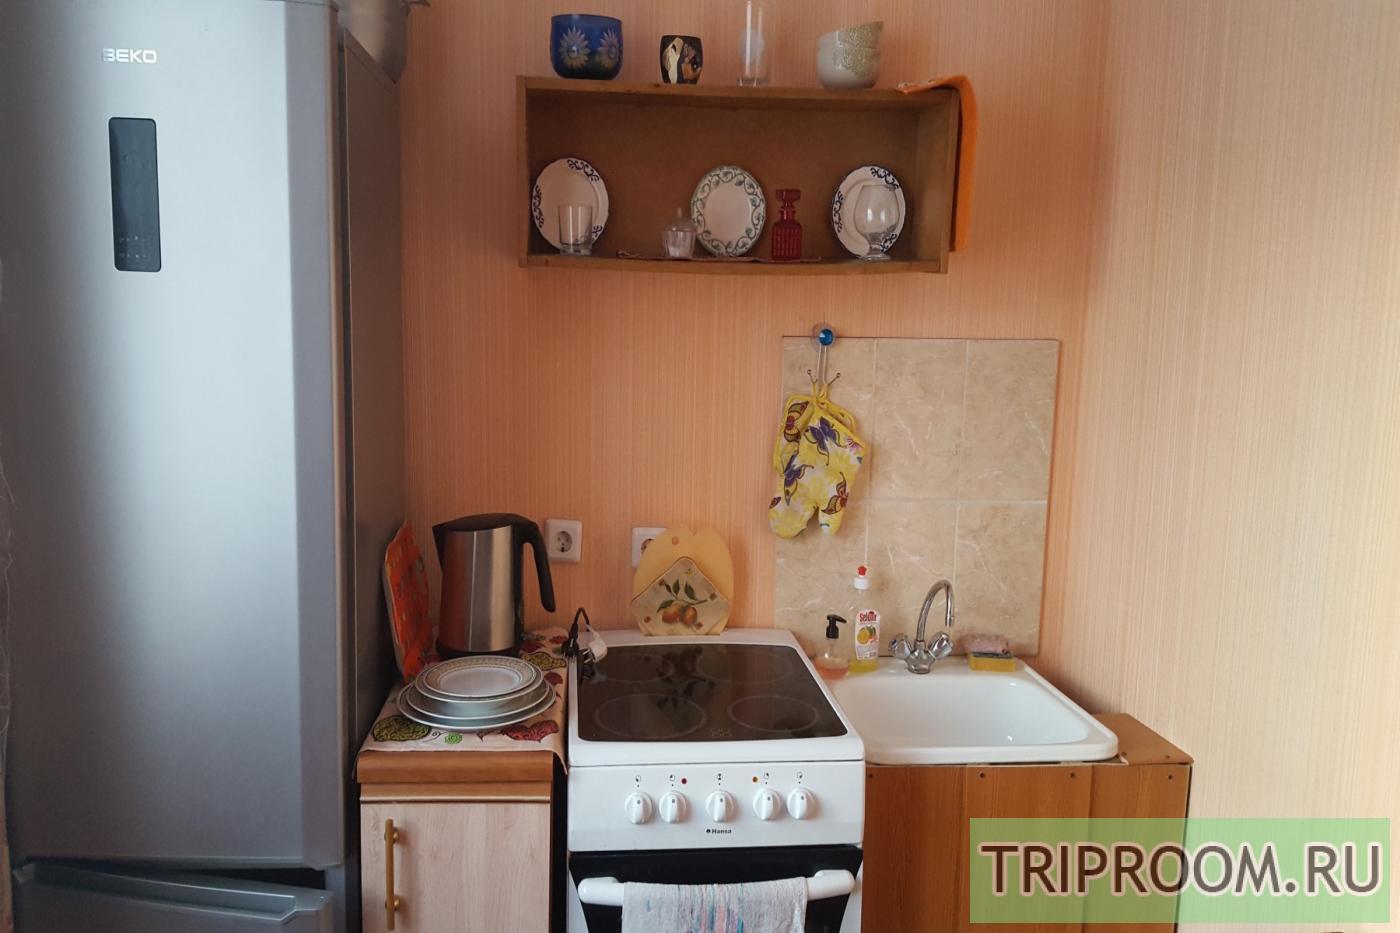 1-комнатная квартира посуточно (вариант № 30847), ул. Строителей улица, фото № 24